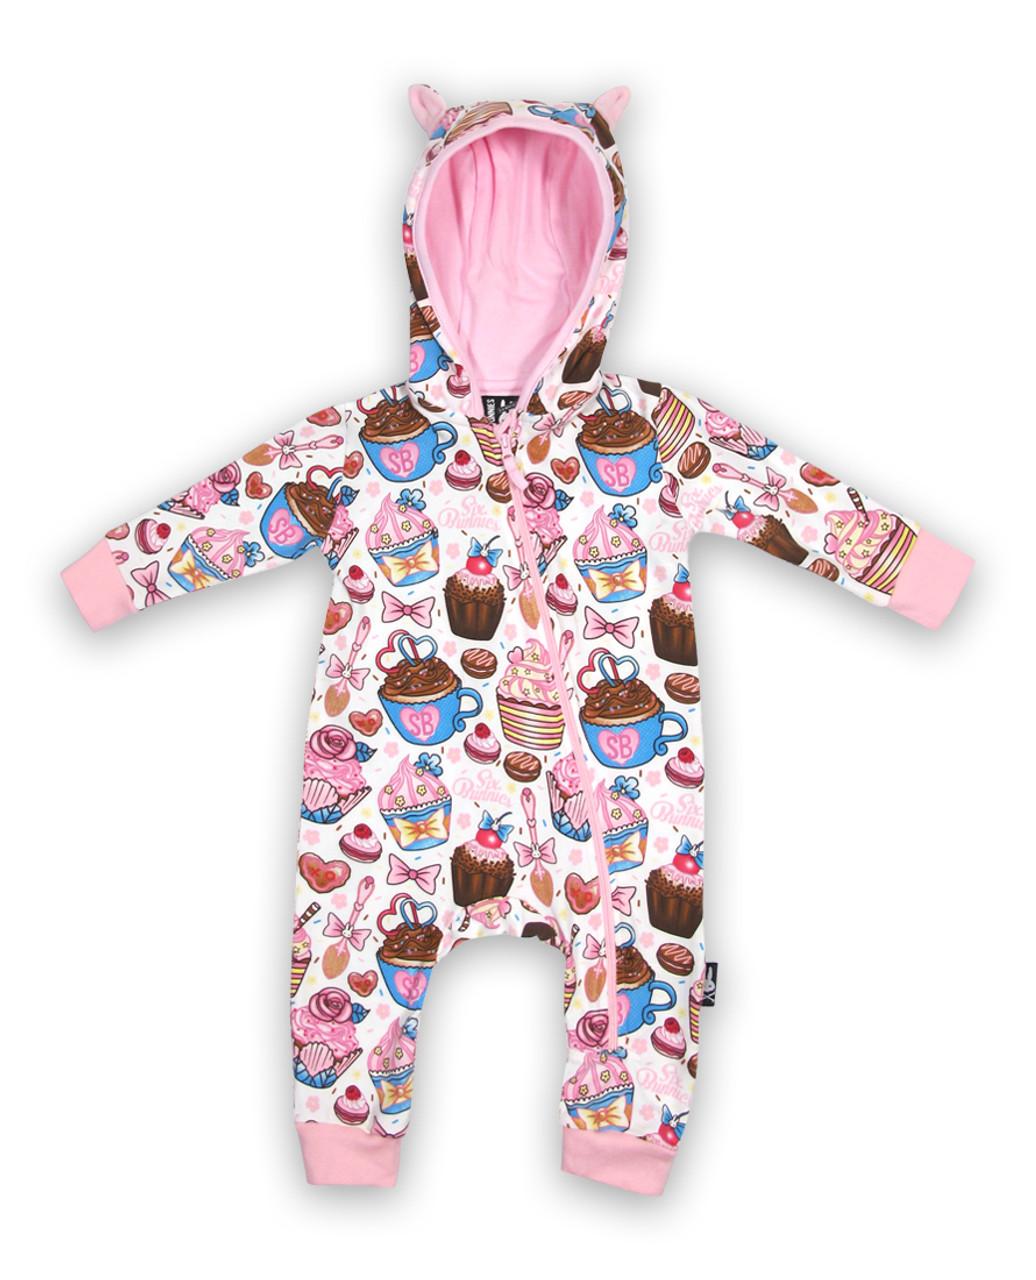 e57d9ecc4aa4 Six Bunnies Cupcakes Baby Playsuit Romper